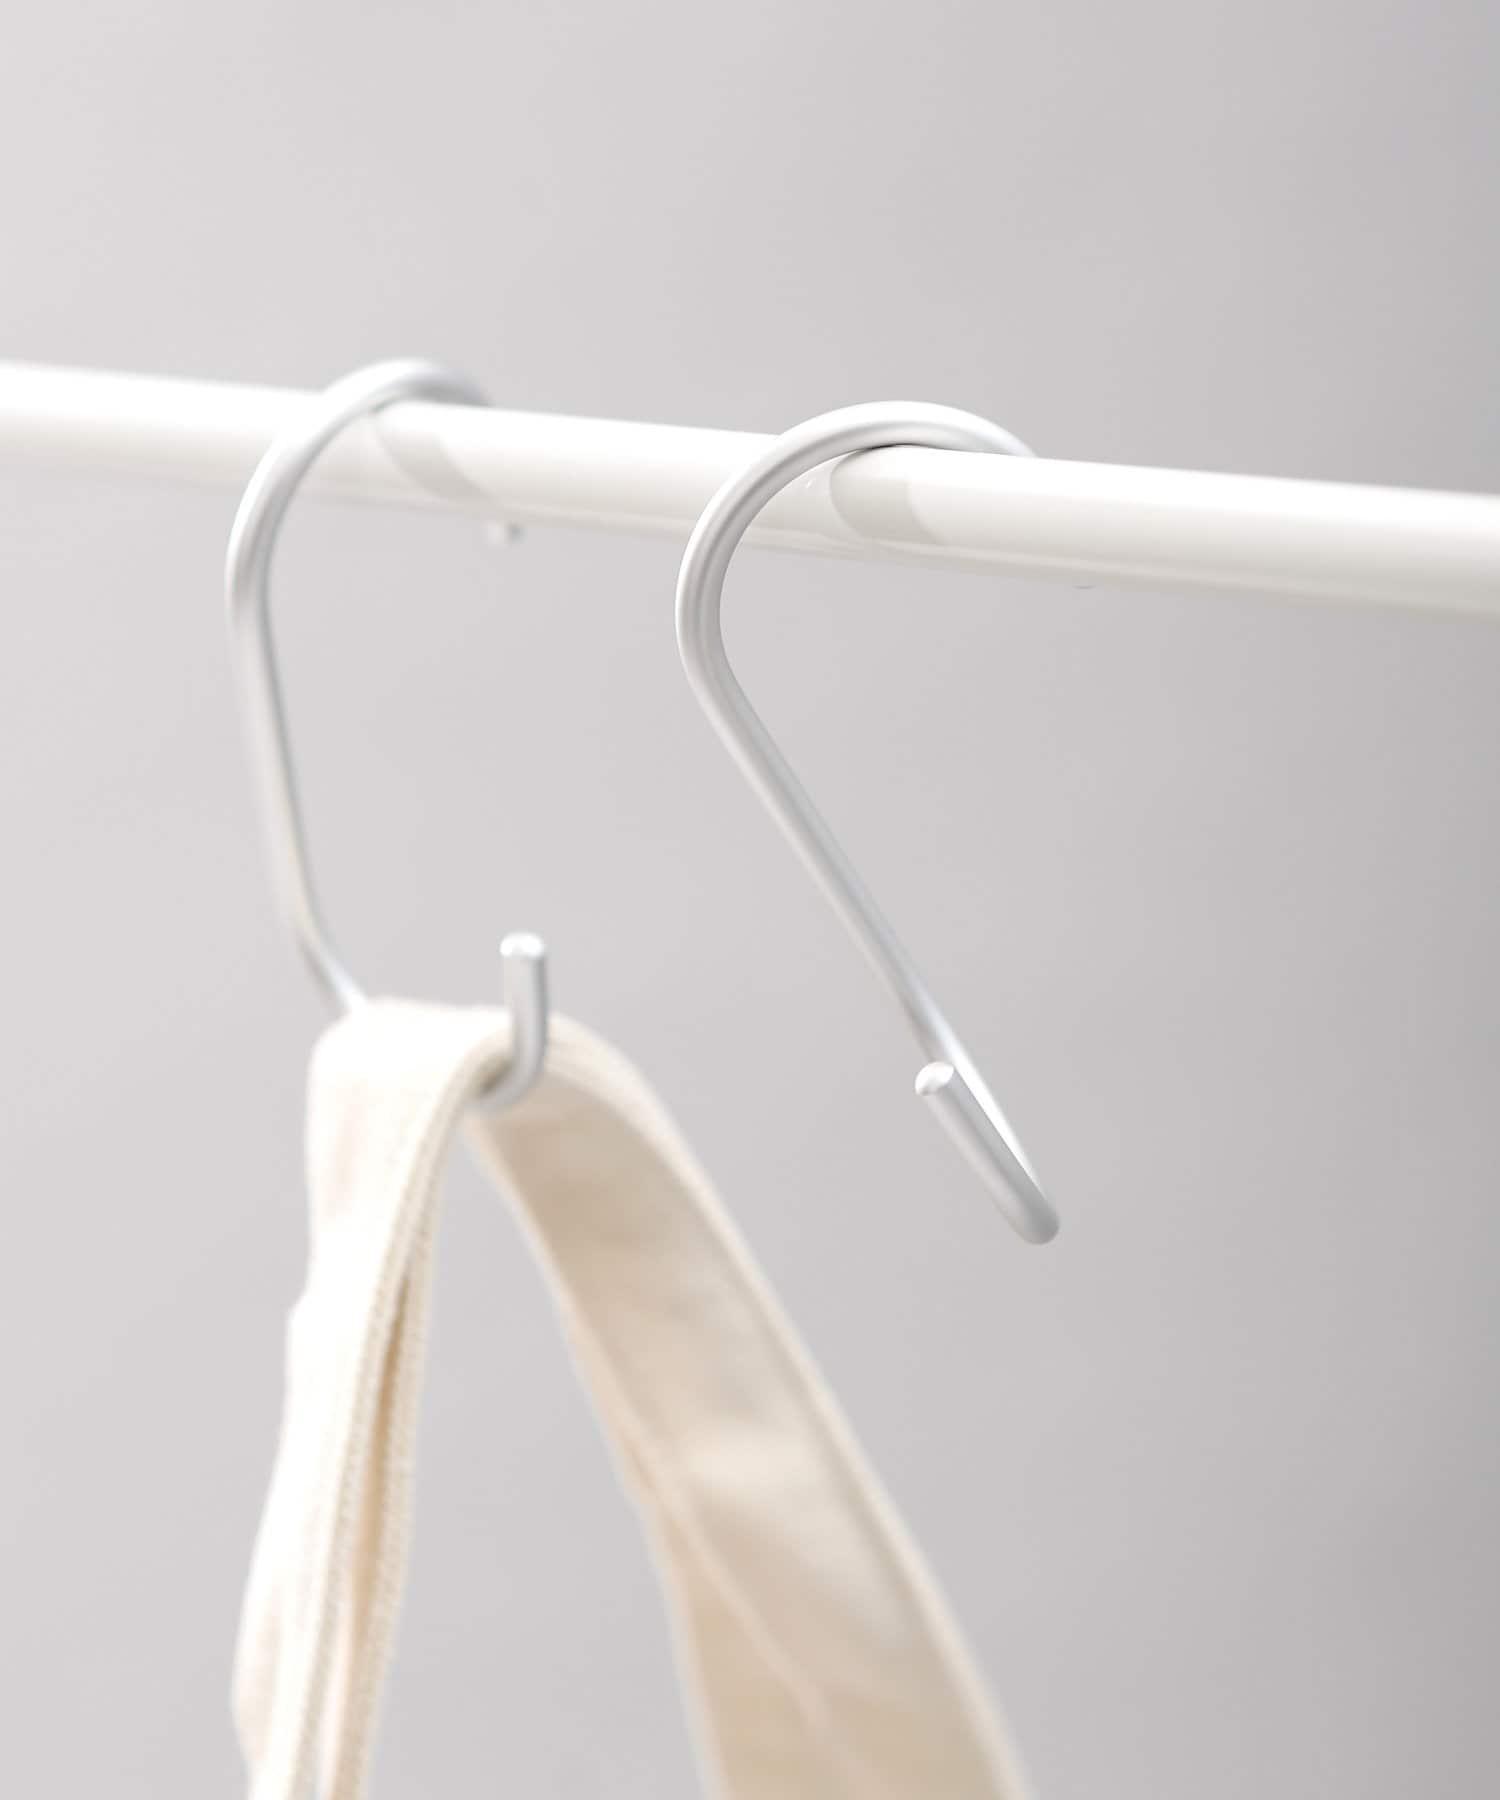 ASOKO(アソコ) ライフスタイル 【ASOKO GOOD STANDARD】ねじれS字フック2個セット シルバー